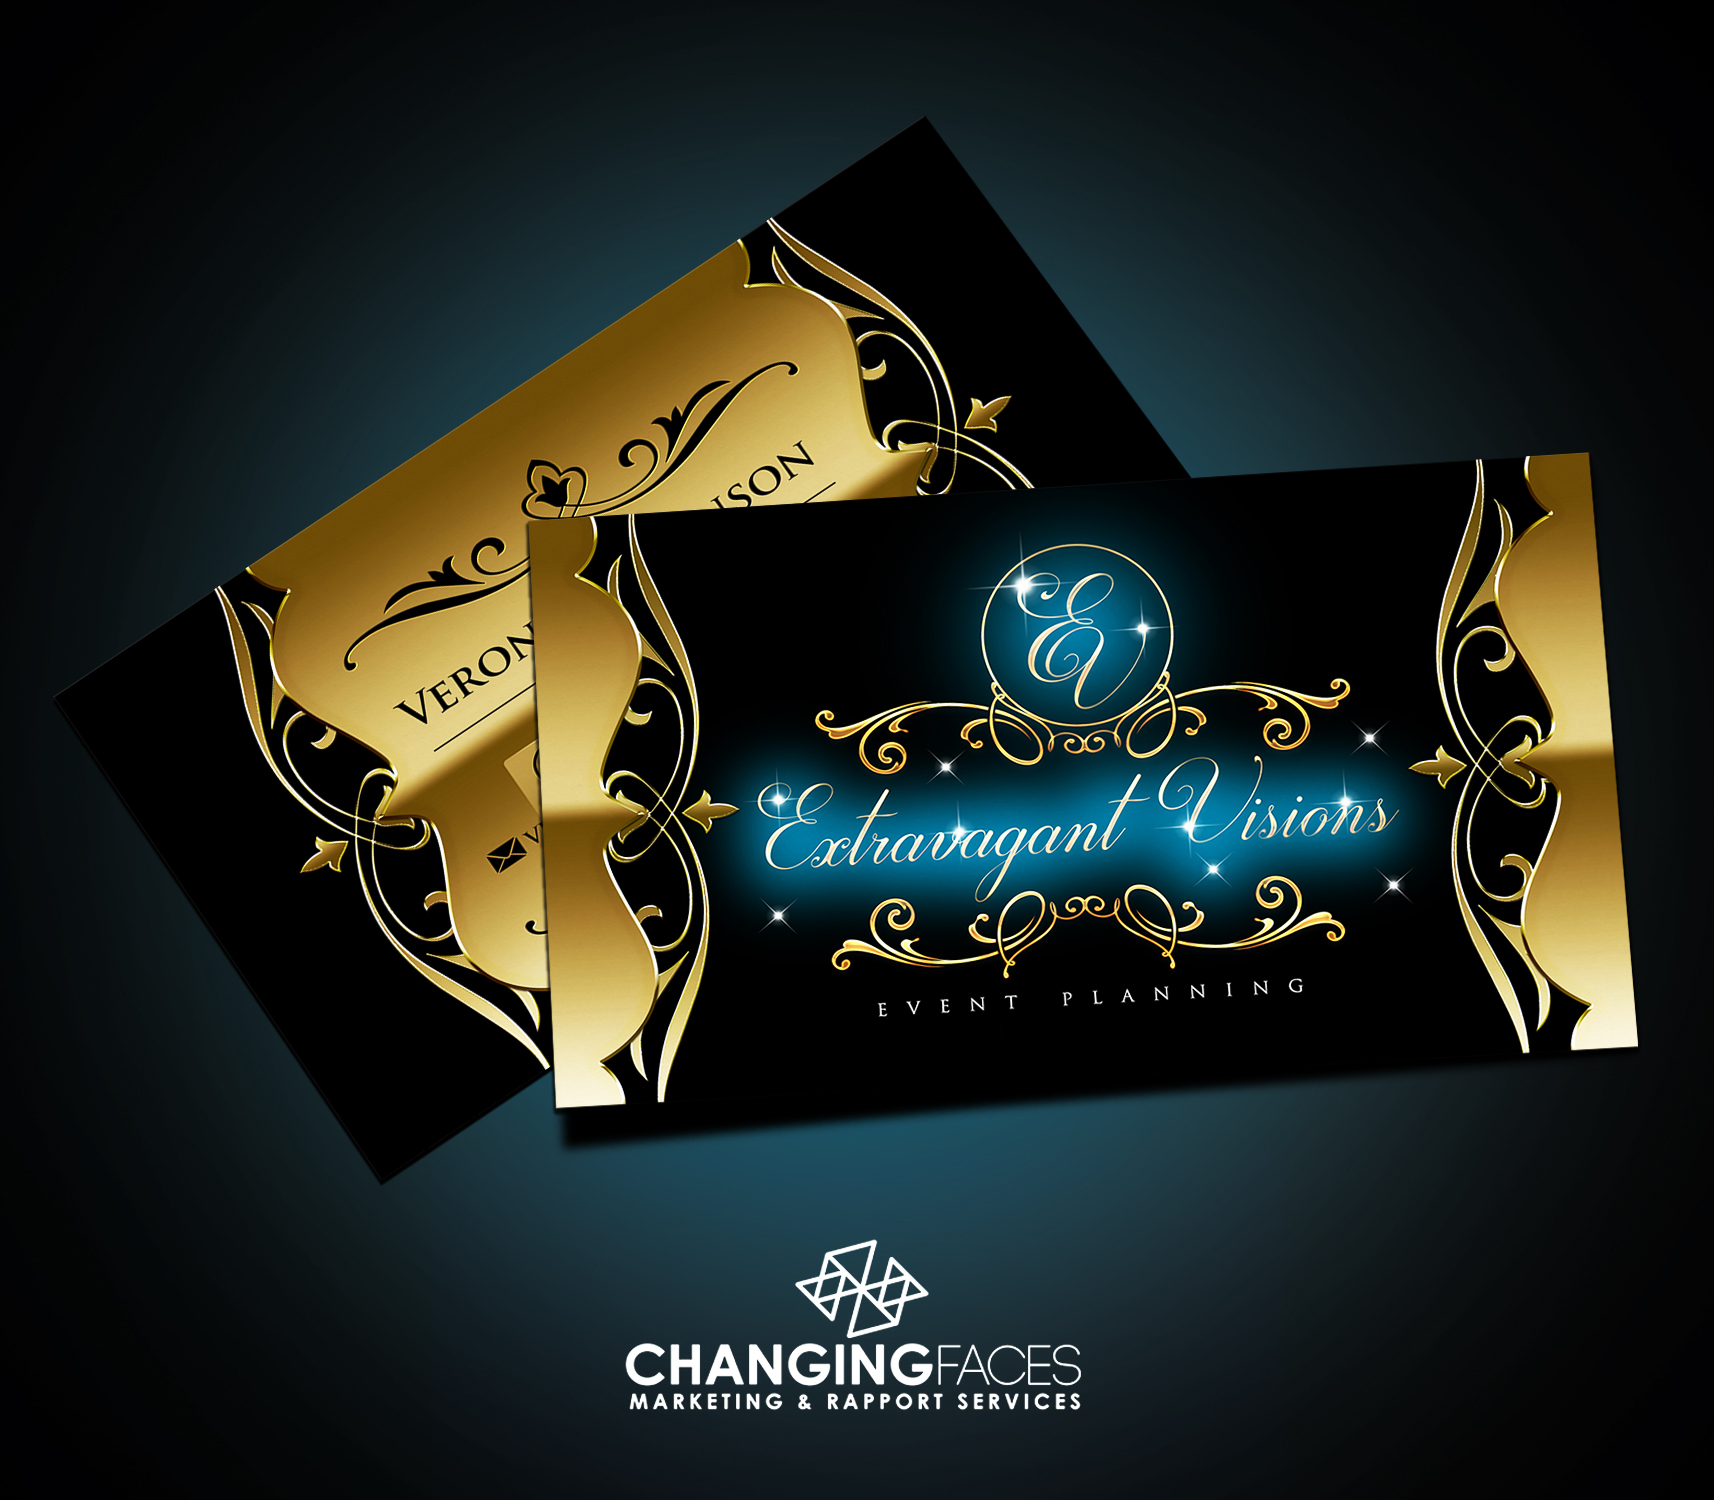 business cards mockup (3)